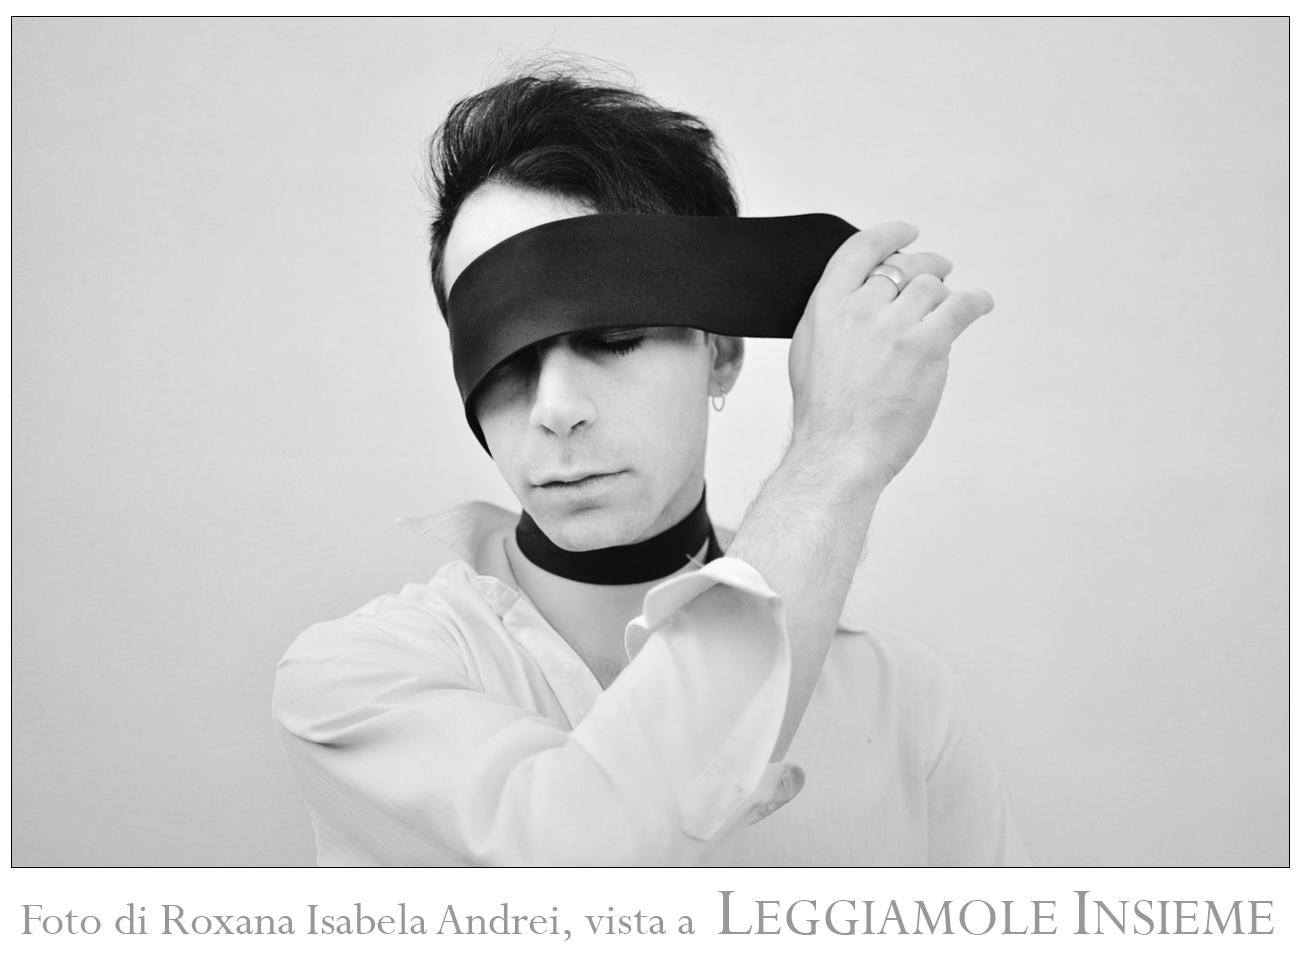 Roxana_Isabela_Andrei